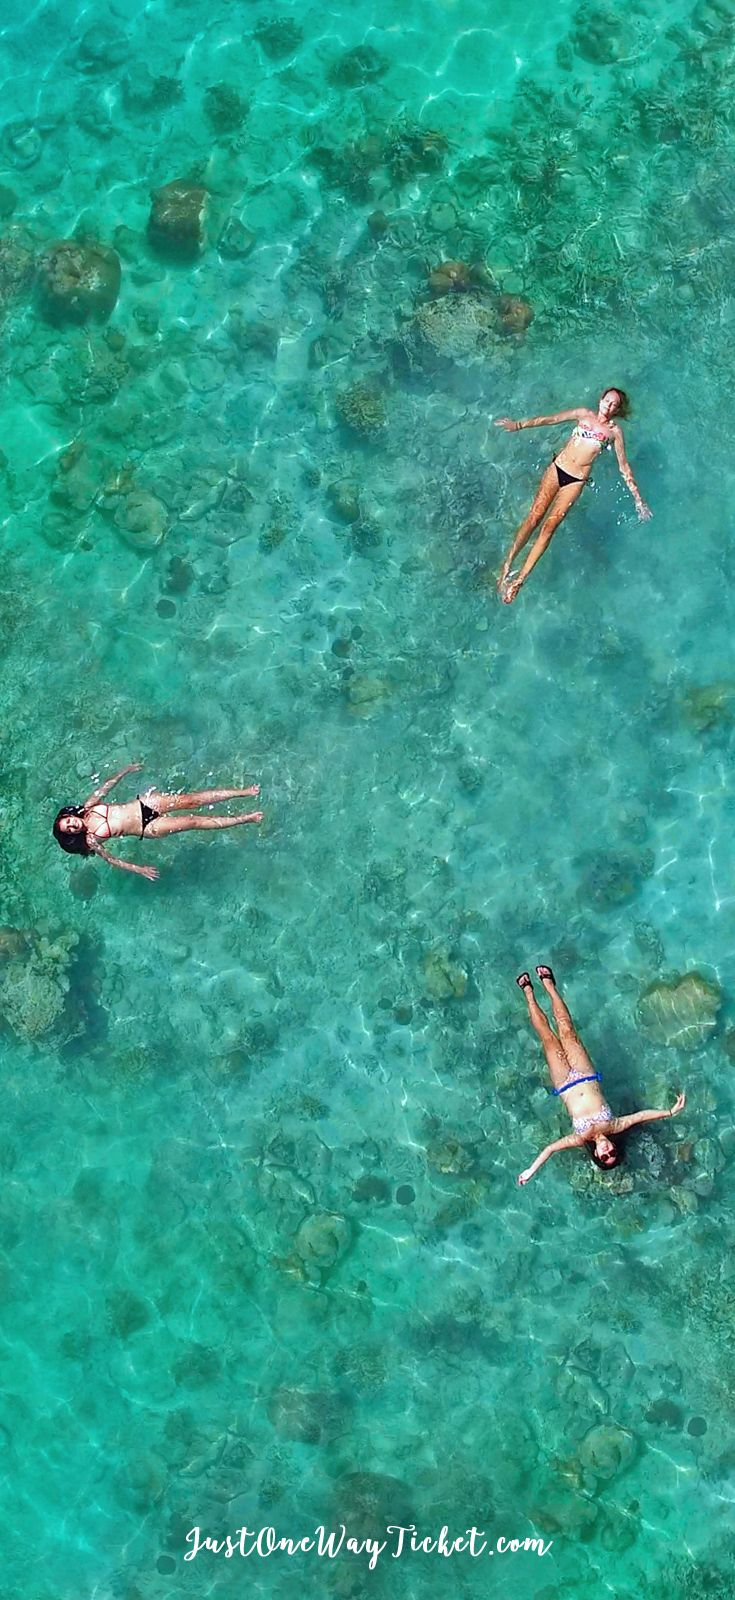 Video: Amazing Drone Footage Of The Philippines – Like You've Never Seen It Before | All recorded with DJI Phantom Drone 3 4K + Osmo | 4K Video | Copyright © @Just1WayTicket | Sabrina Iovino & Güçlü Kamberović